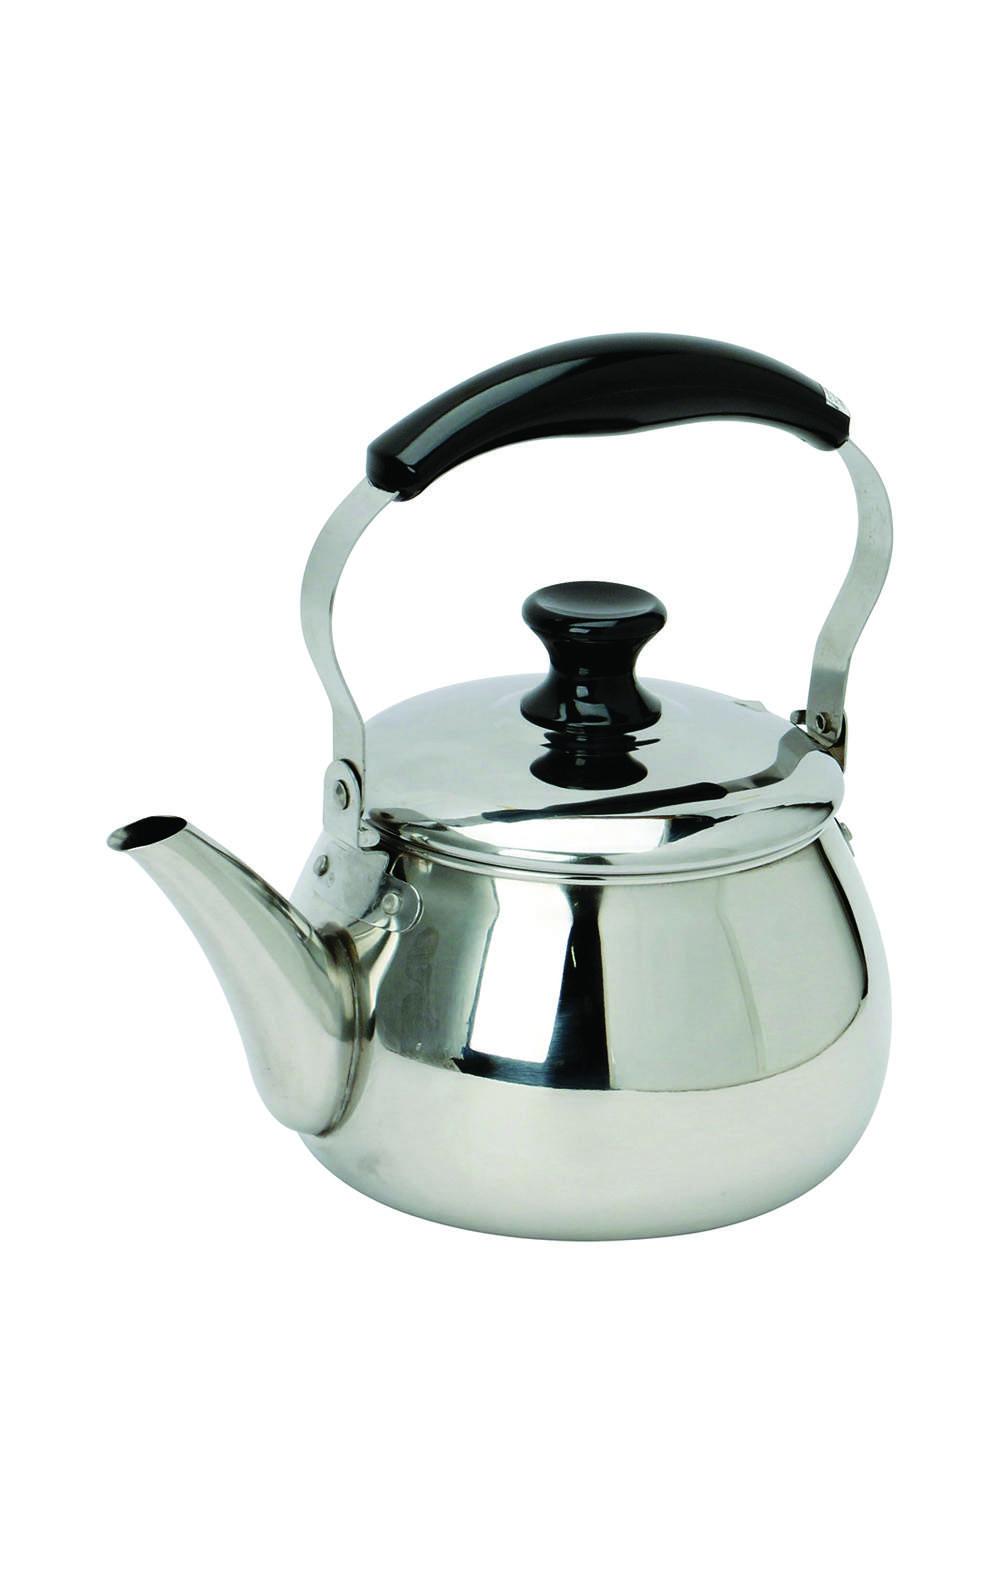 Pearl Metal HB-7124 Oruti 18-8 stainless steel kettle 1.6 L ابريق